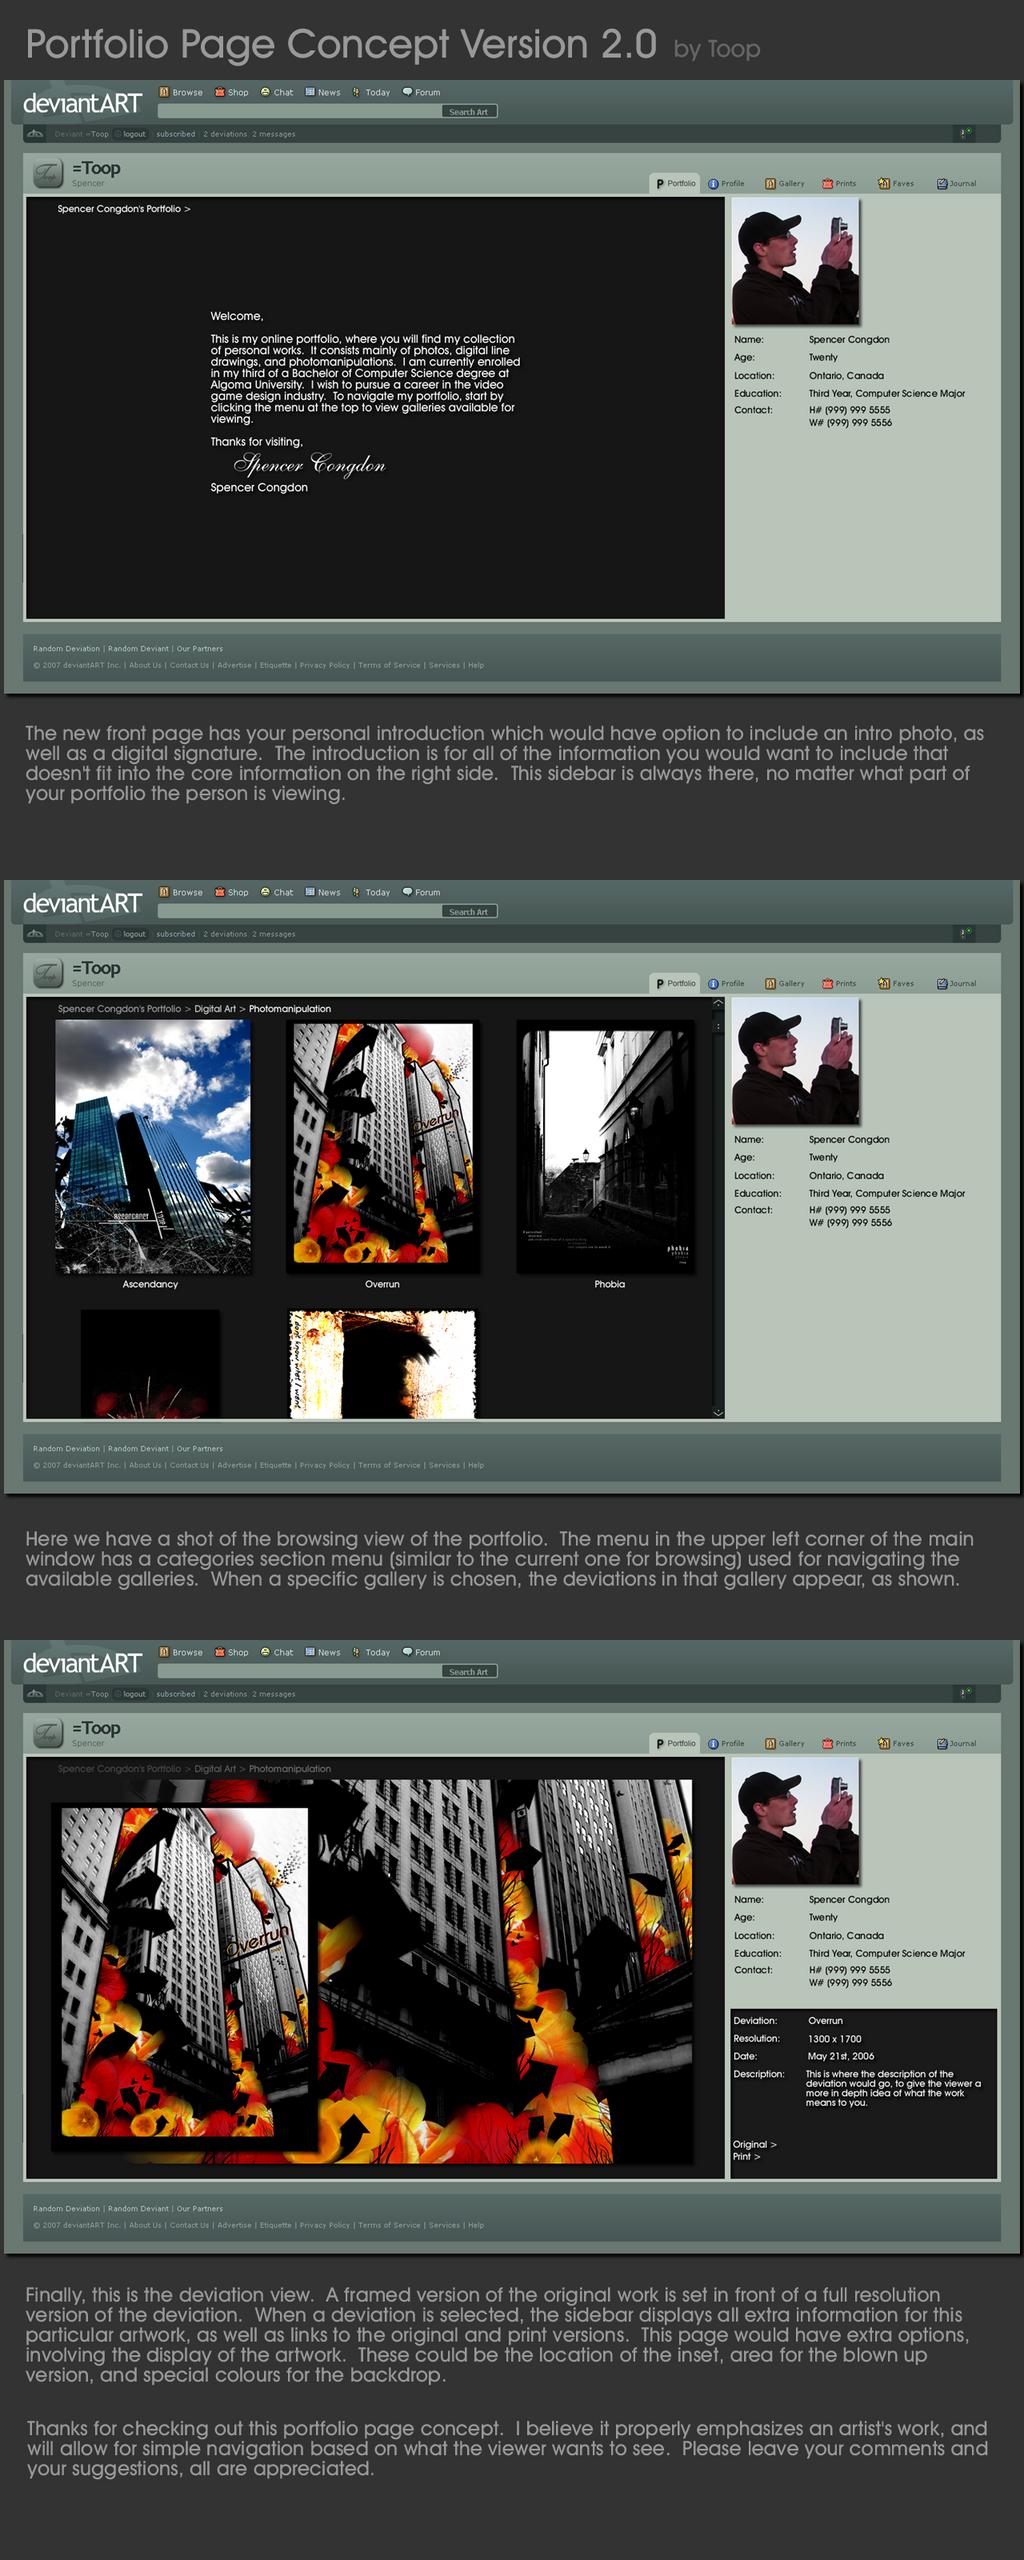 Portfolio Page Concept V.2.0 by Toop